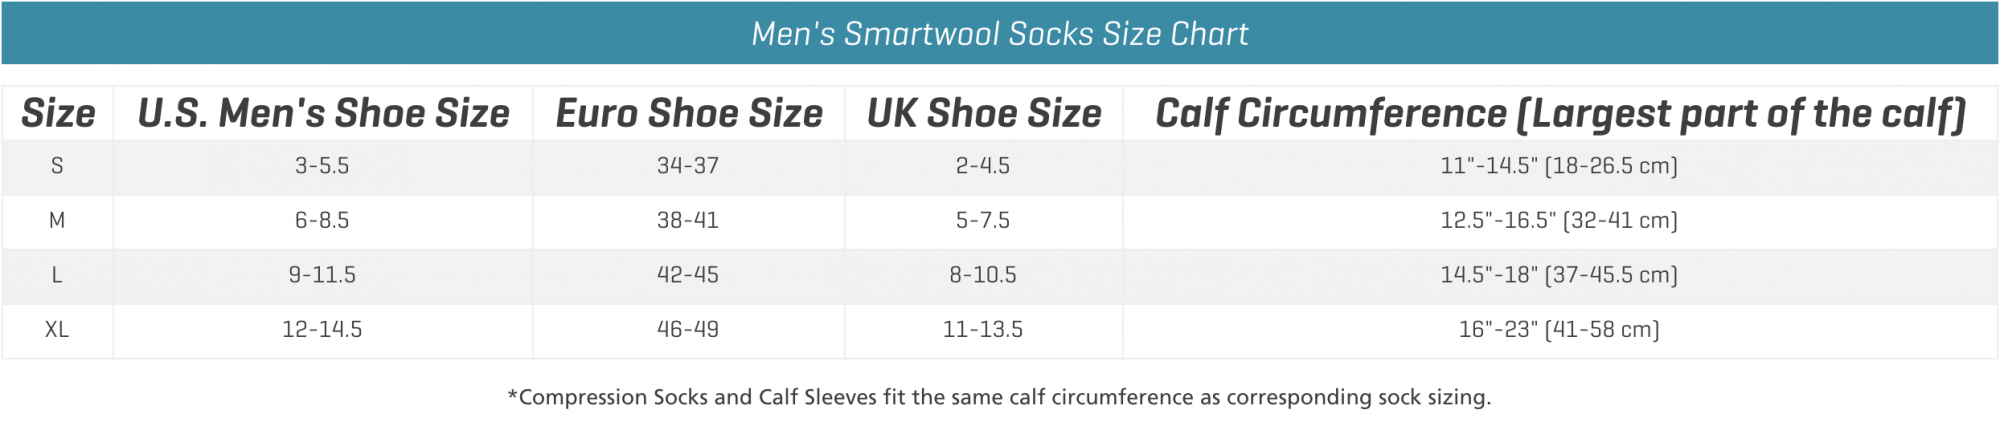 Smartwool Men Socks